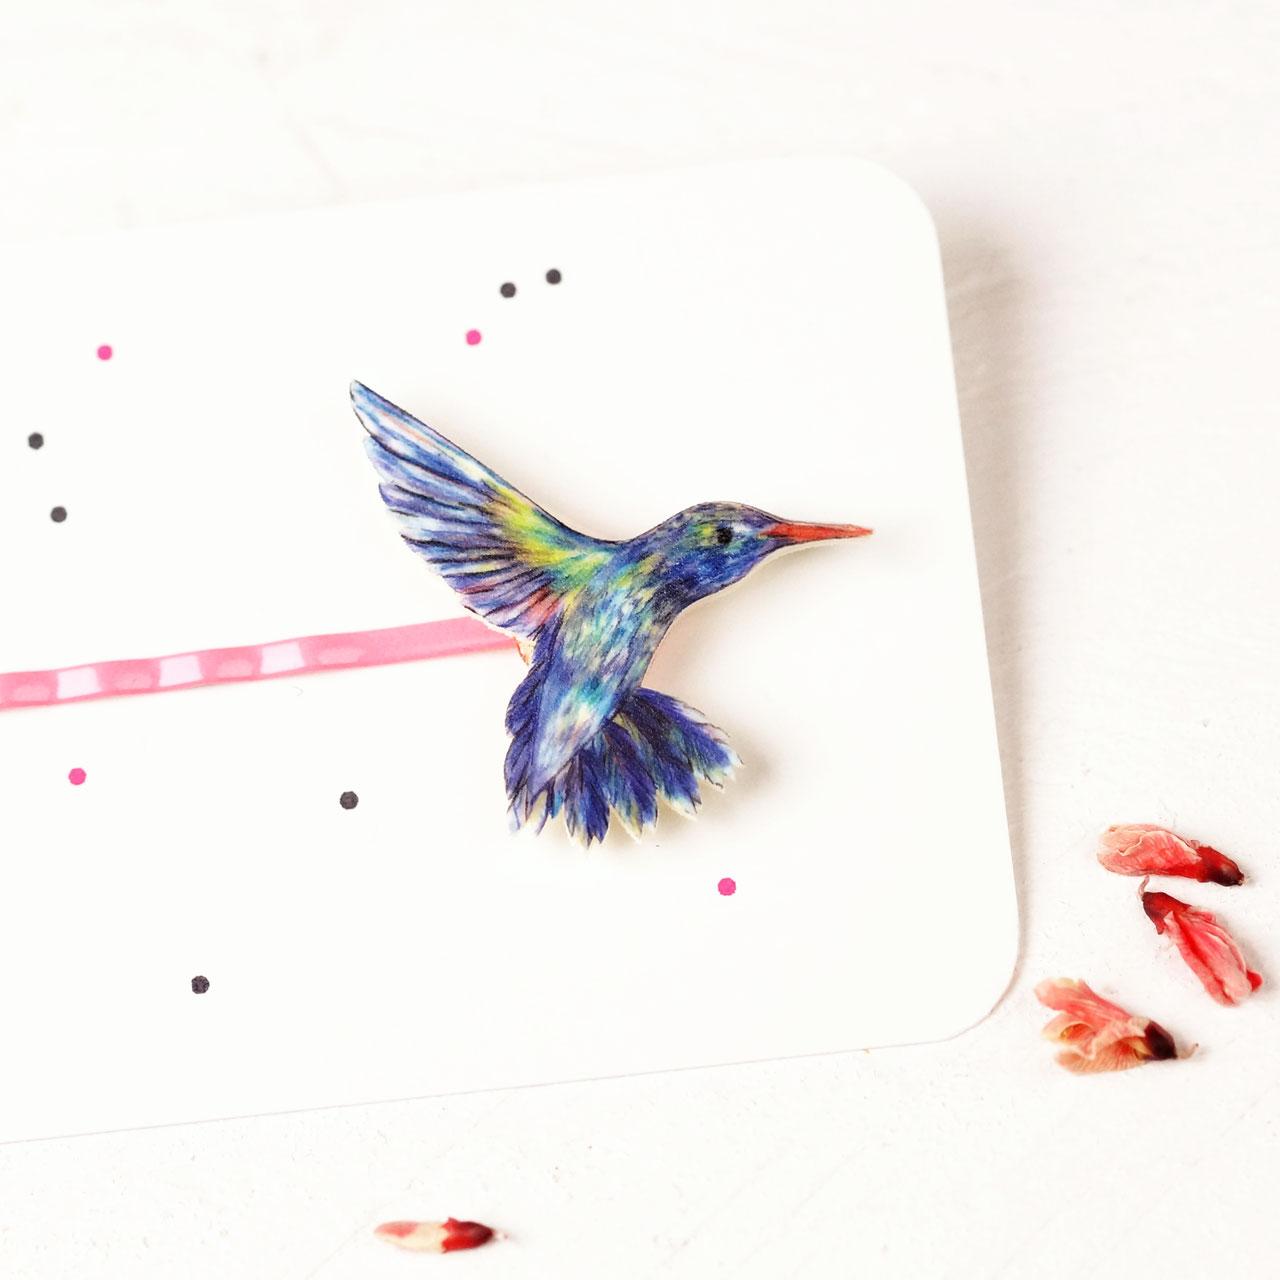 kolibri haarklammer kolibri vogelschmuck fraufischers. Black Bedroom Furniture Sets. Home Design Ideas